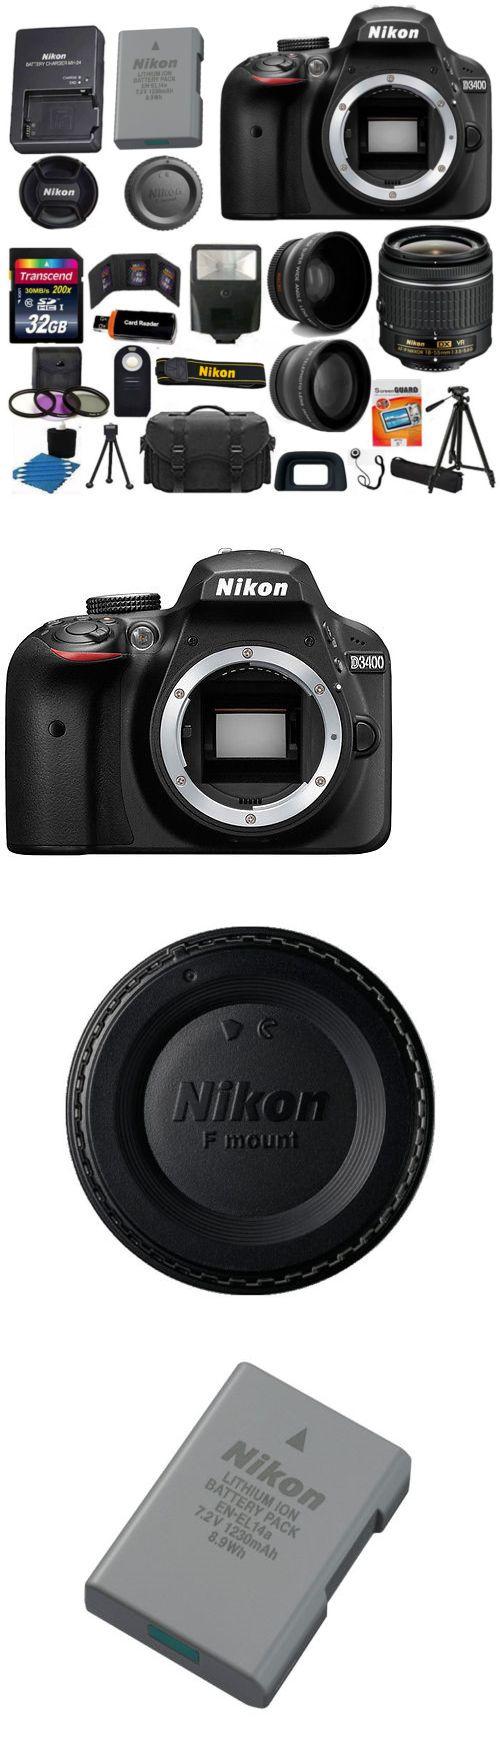 Camera Best Brand Of Dslr Camera 1000 ideas about best digital slr camera on pinterest cameras and camera